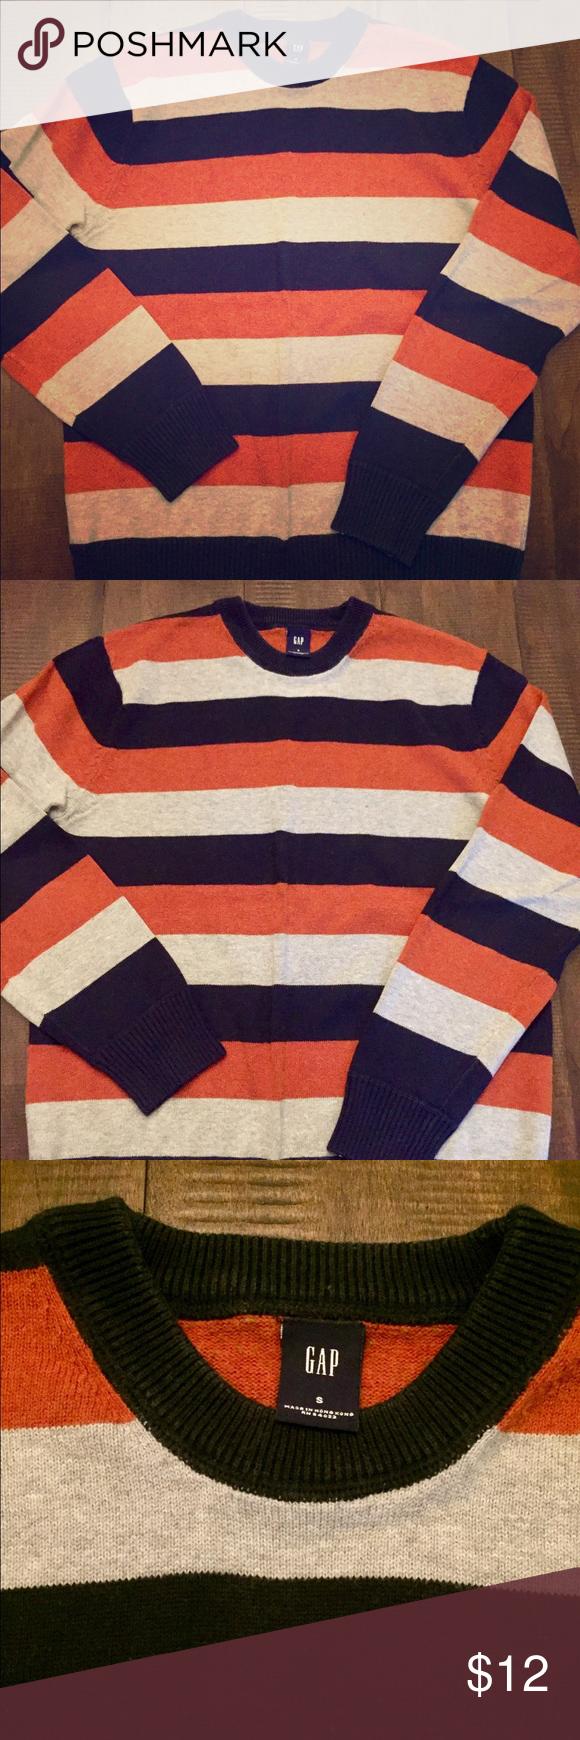 Men's GAP Striped Sweater Size Small Men's GAP Striped Sweater ...